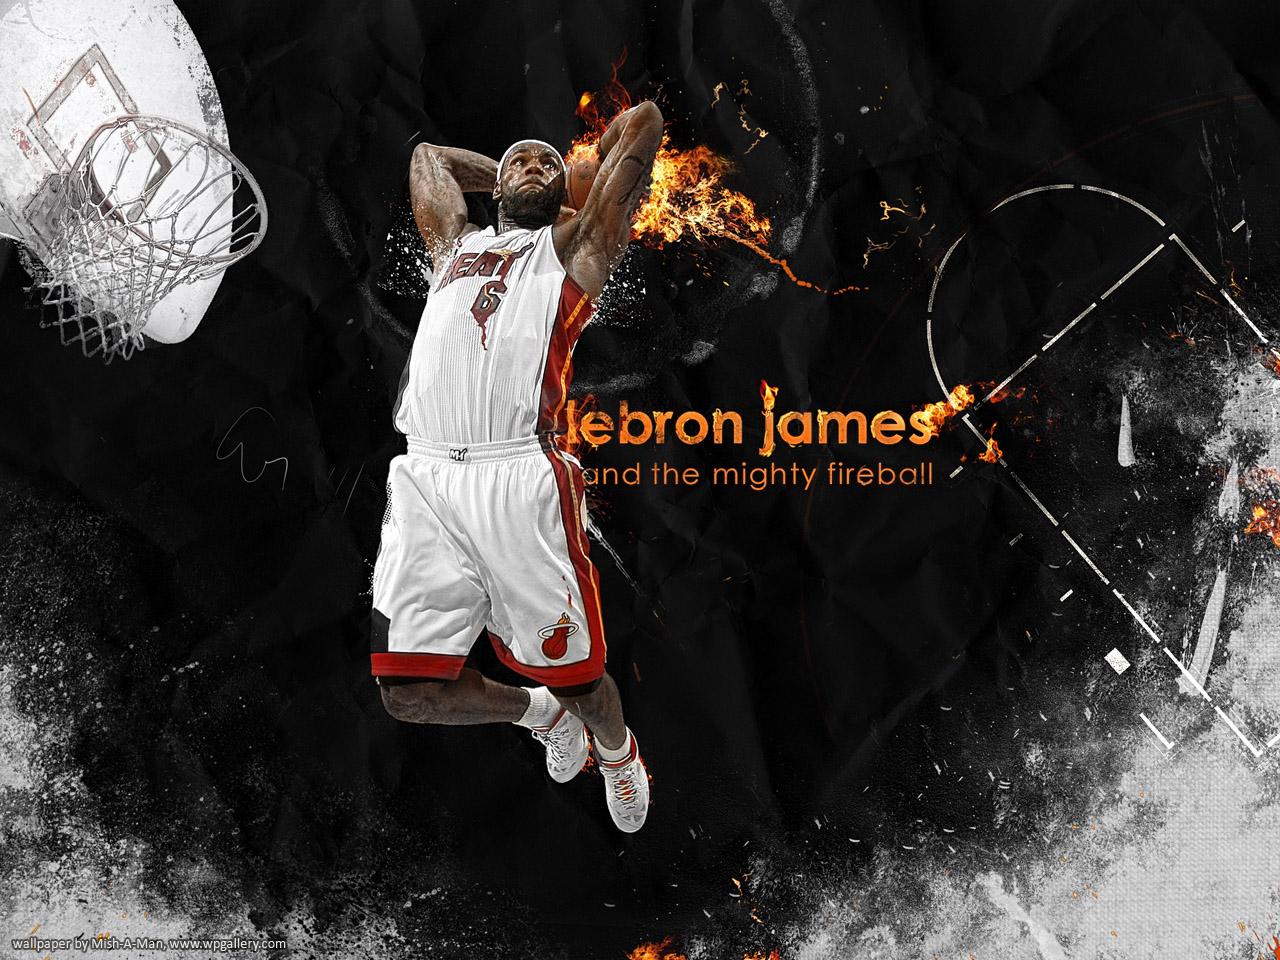 Download Lebron James Miami Heat Wallpaper Mvp Apps 1280x960